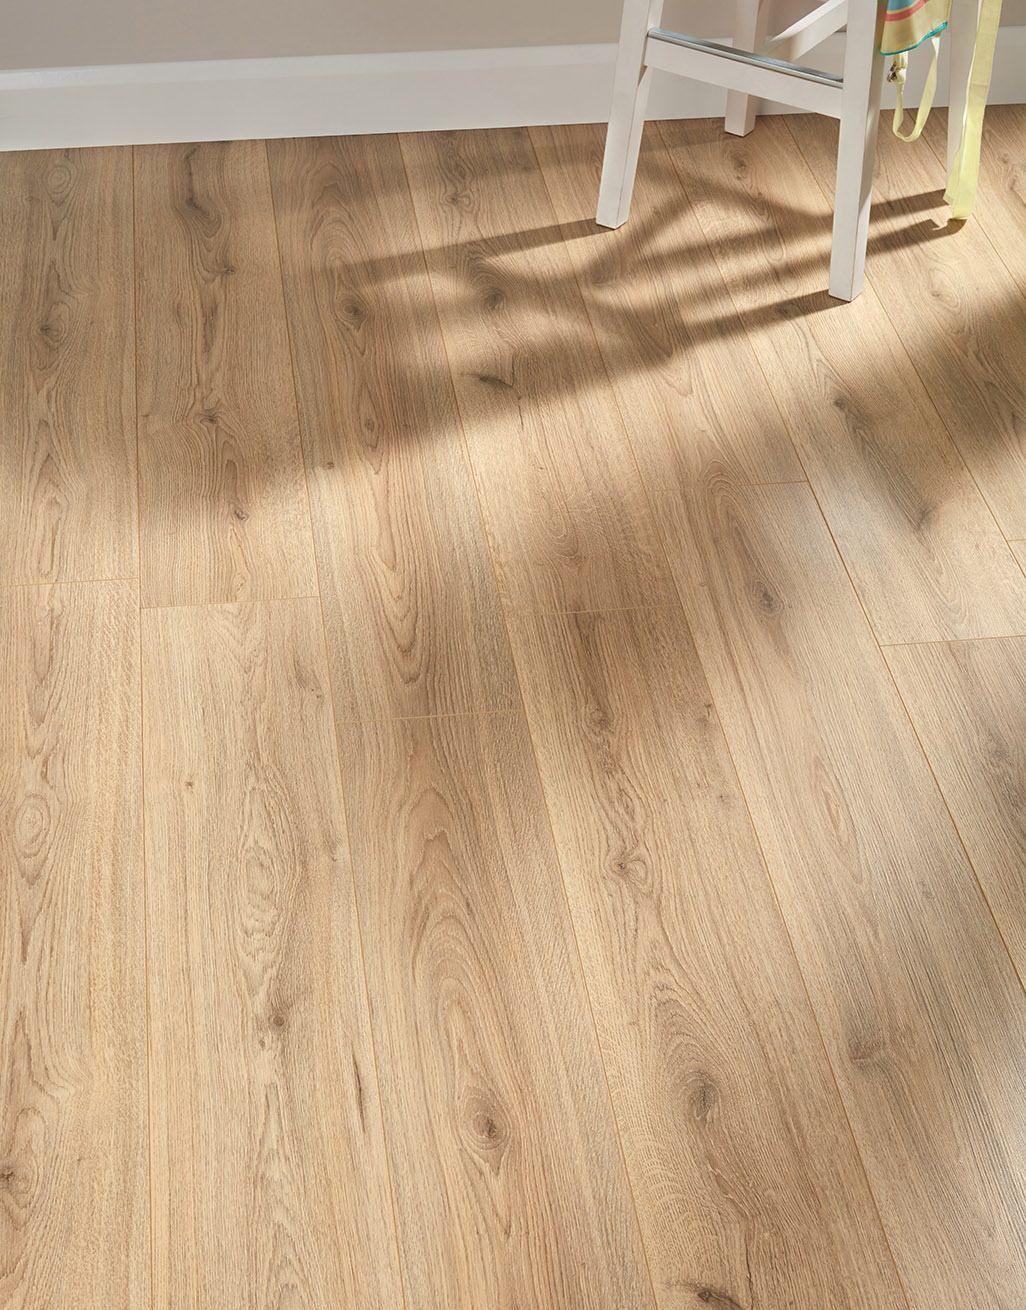 Woodland Oak Laminate Flooring, Woodland Oak Laminate Flooring